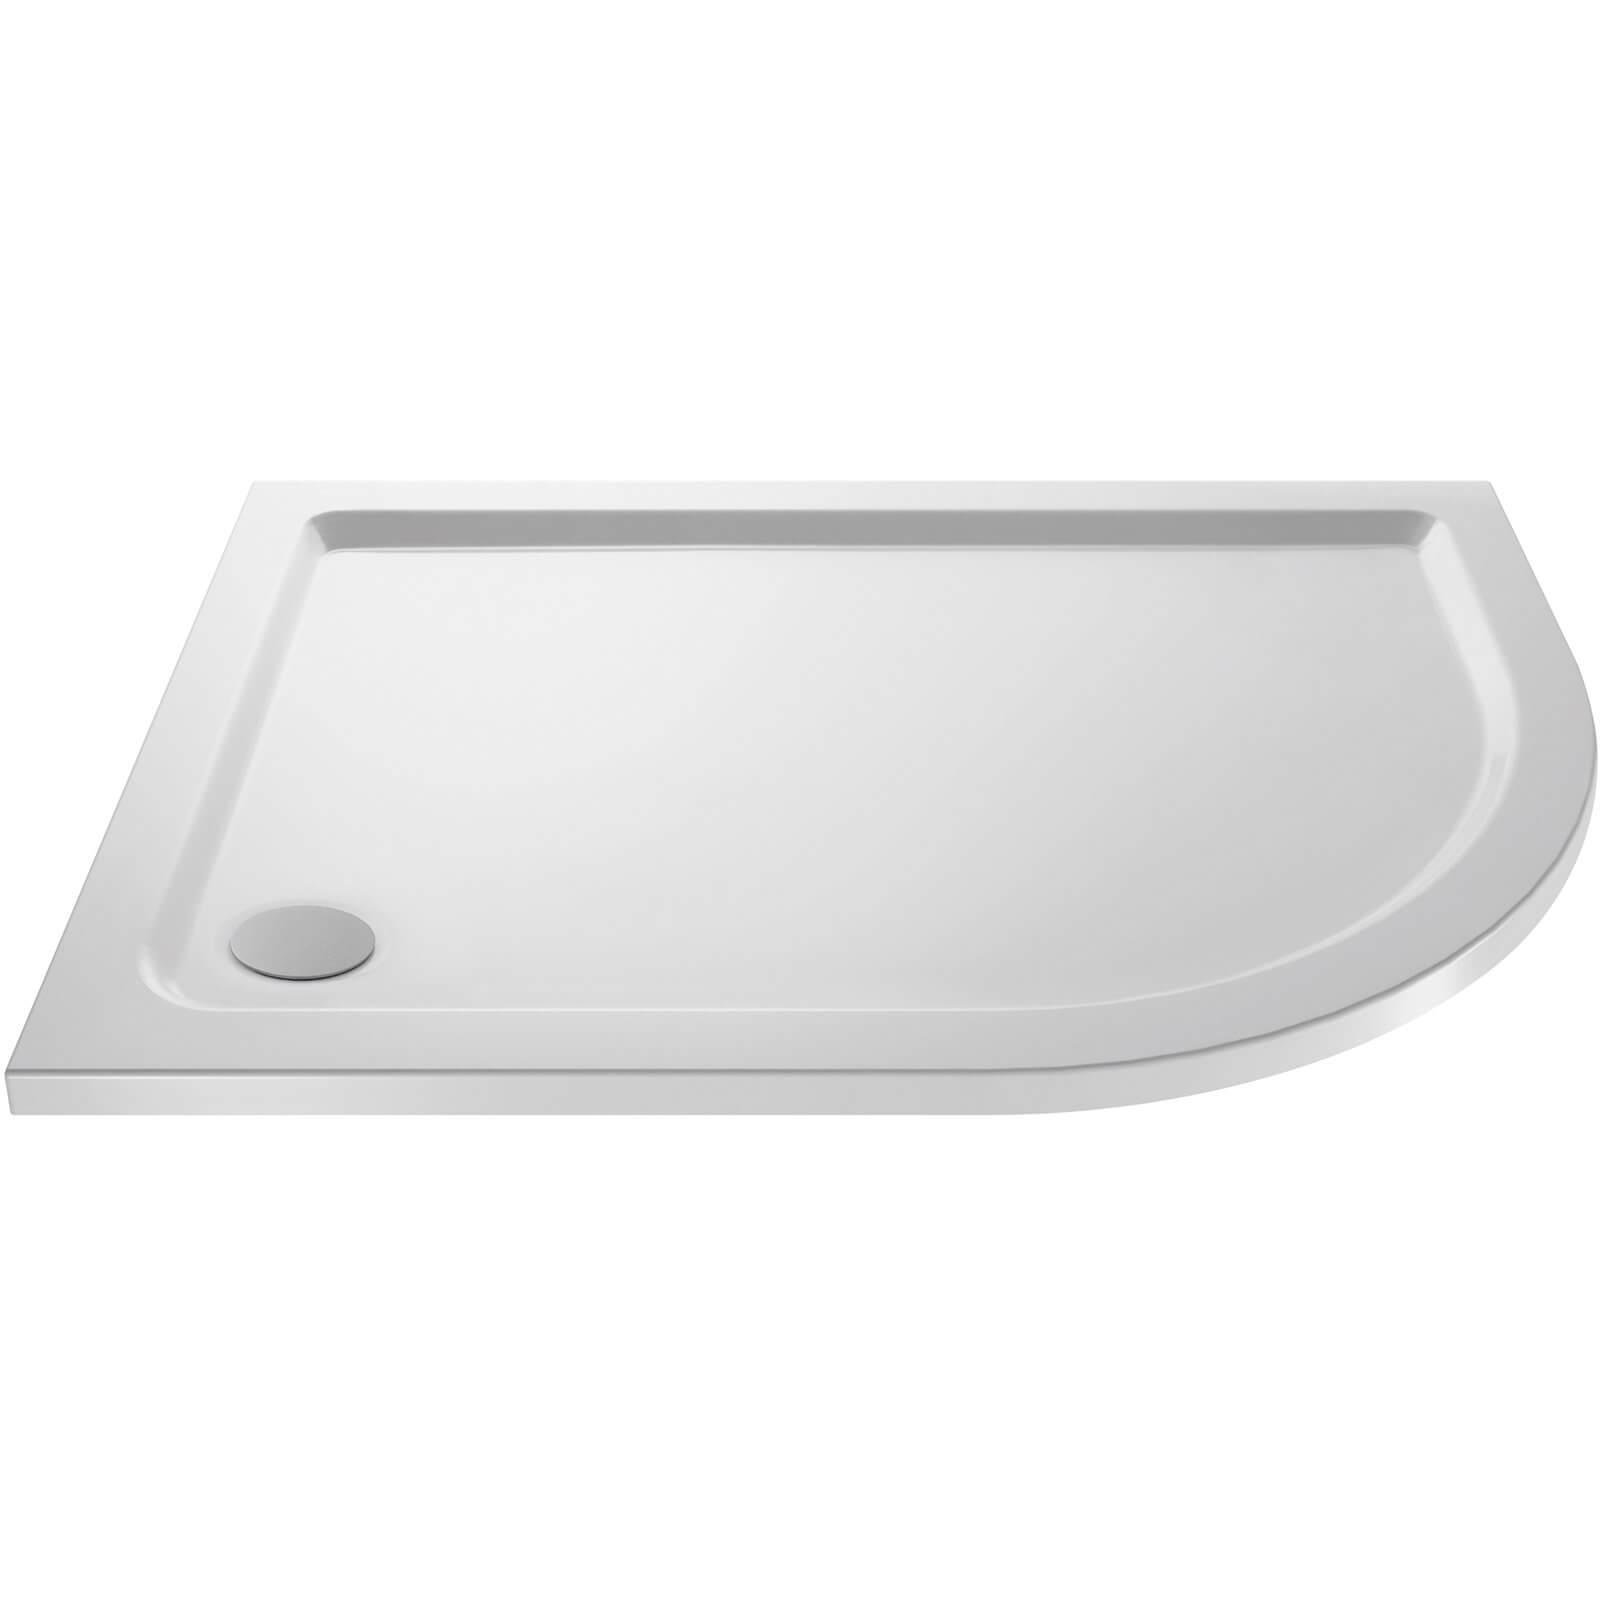 Balterley Right Hand Offset Quadrant Shower Tray - 900 x 760mm